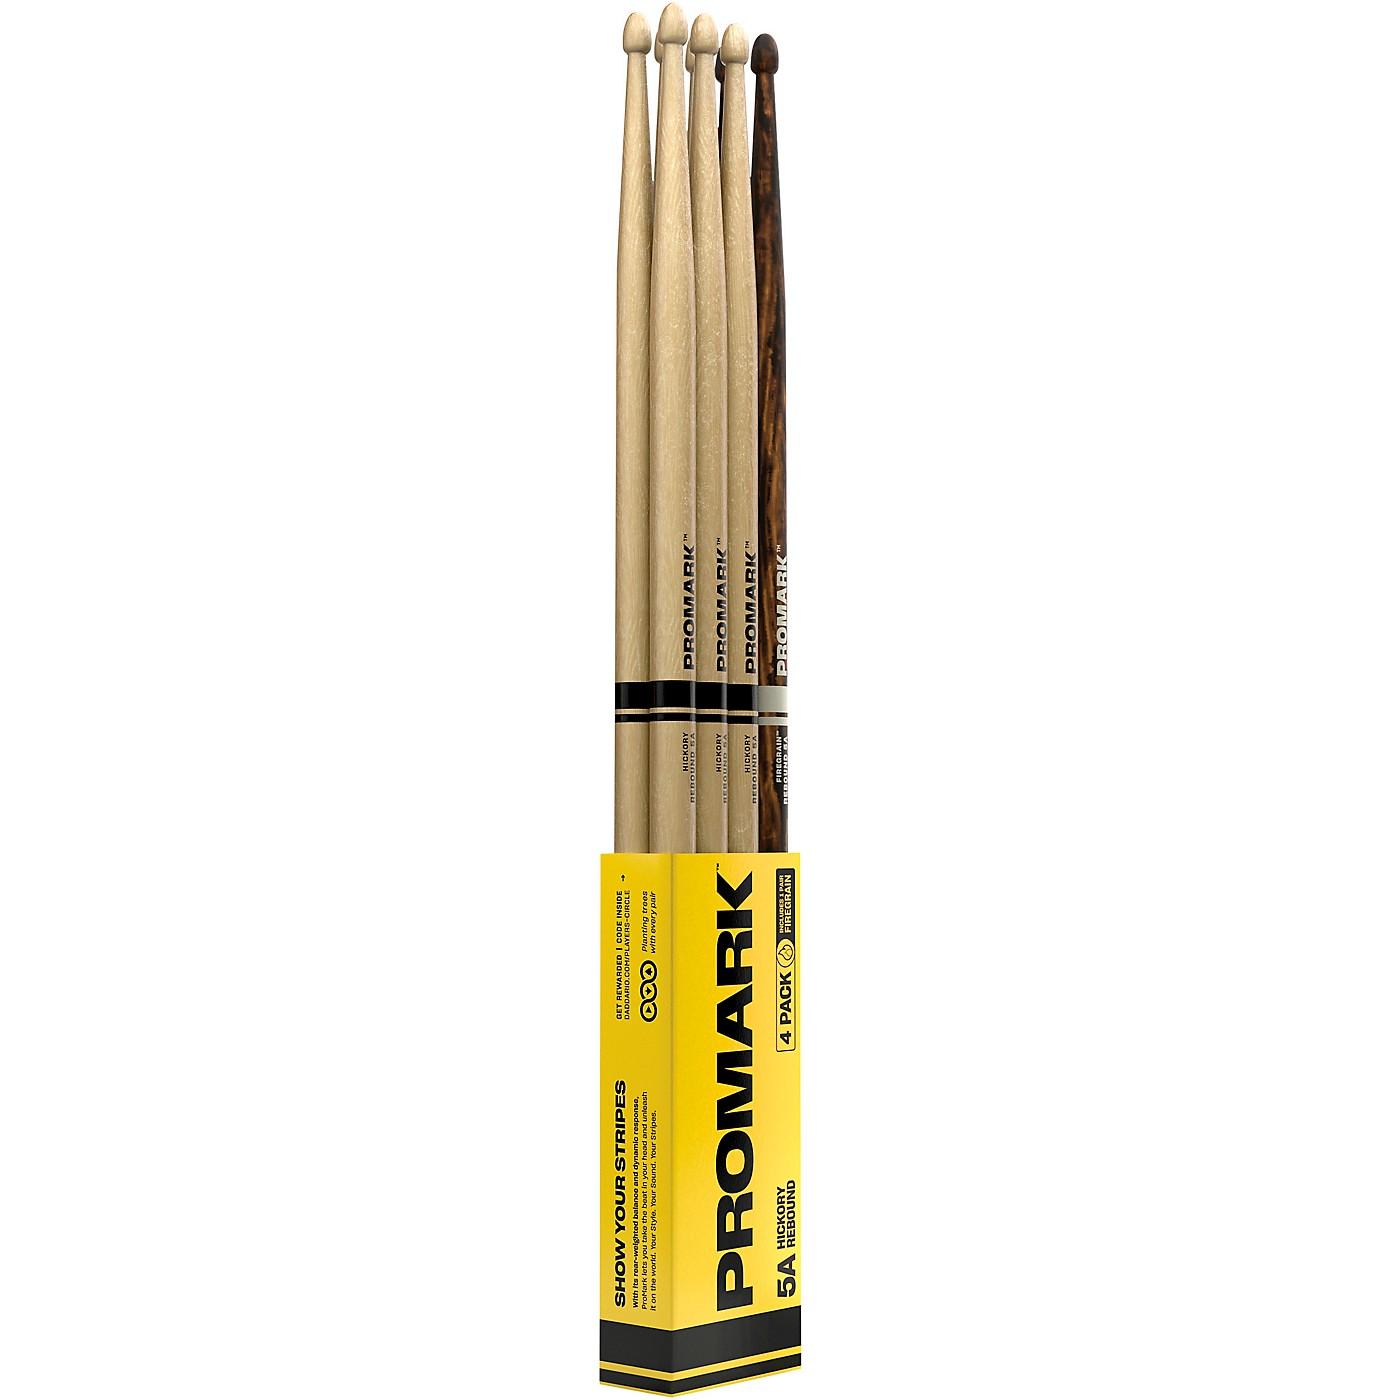 Promark Rebound Hickory Acorn Tip 3+1 FireGrain Drum Sticks 4-Pack thumbnail